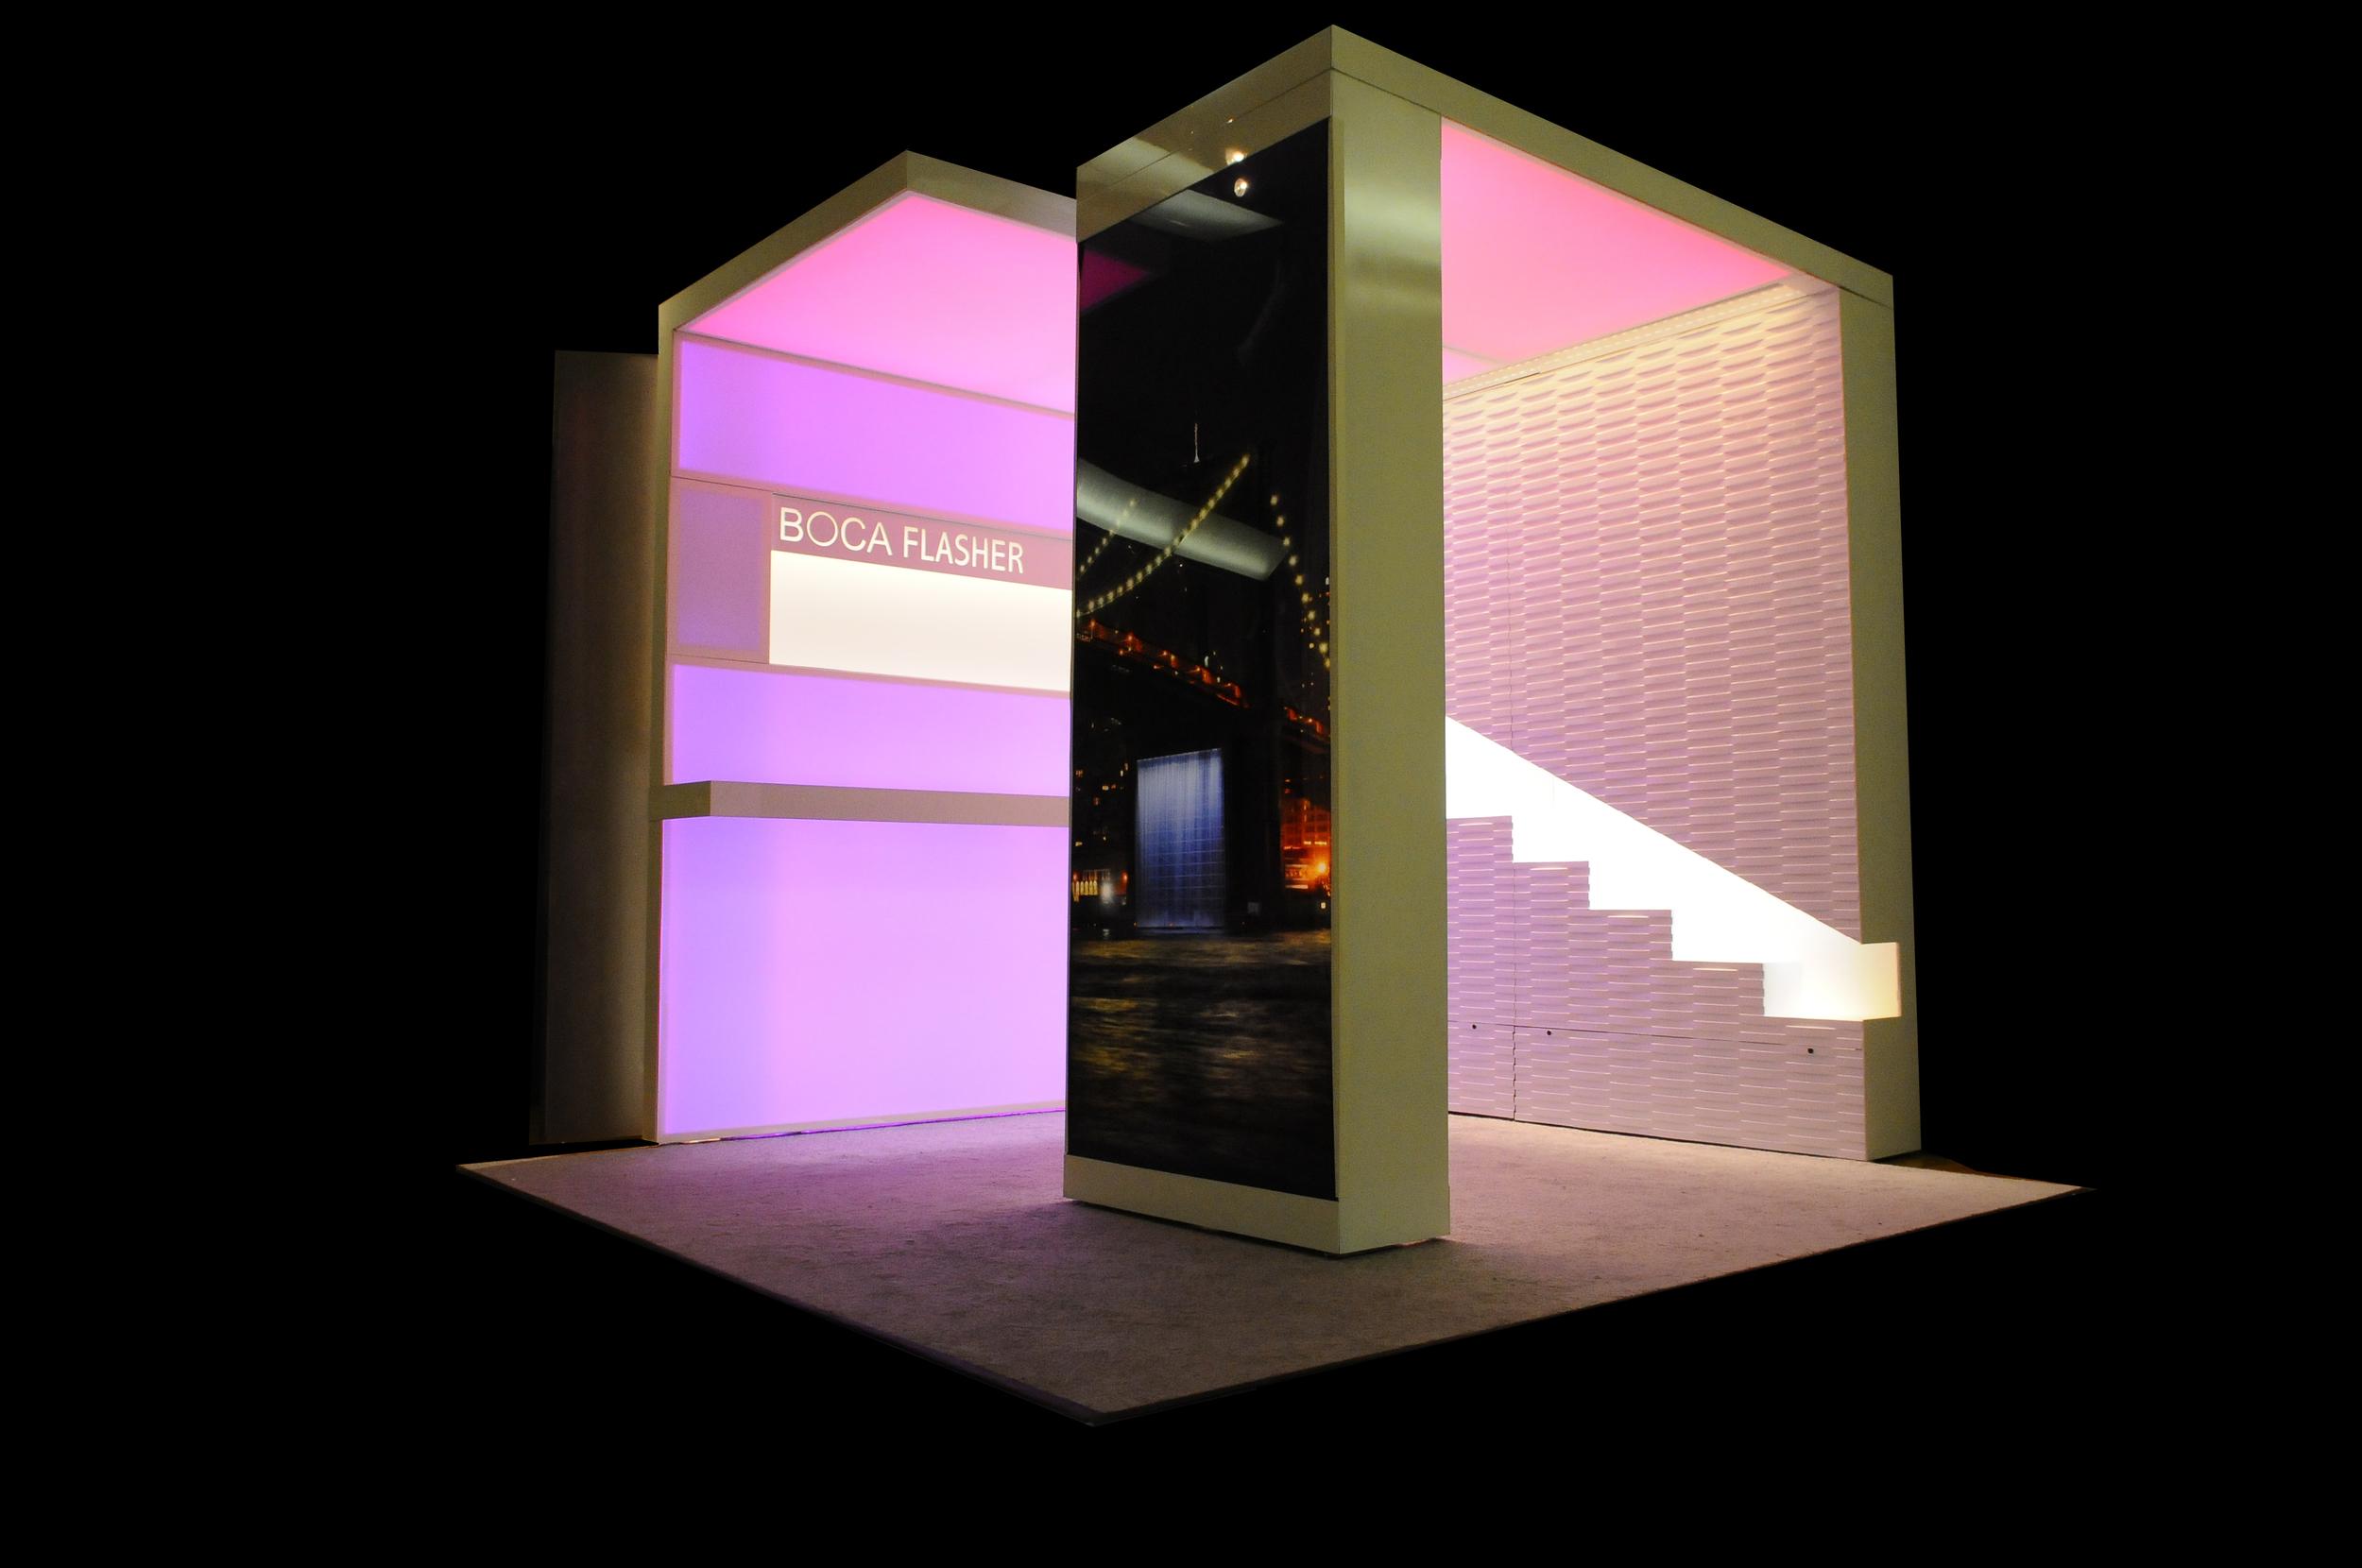 Boca Flasher Branded Tradeshow Event Design